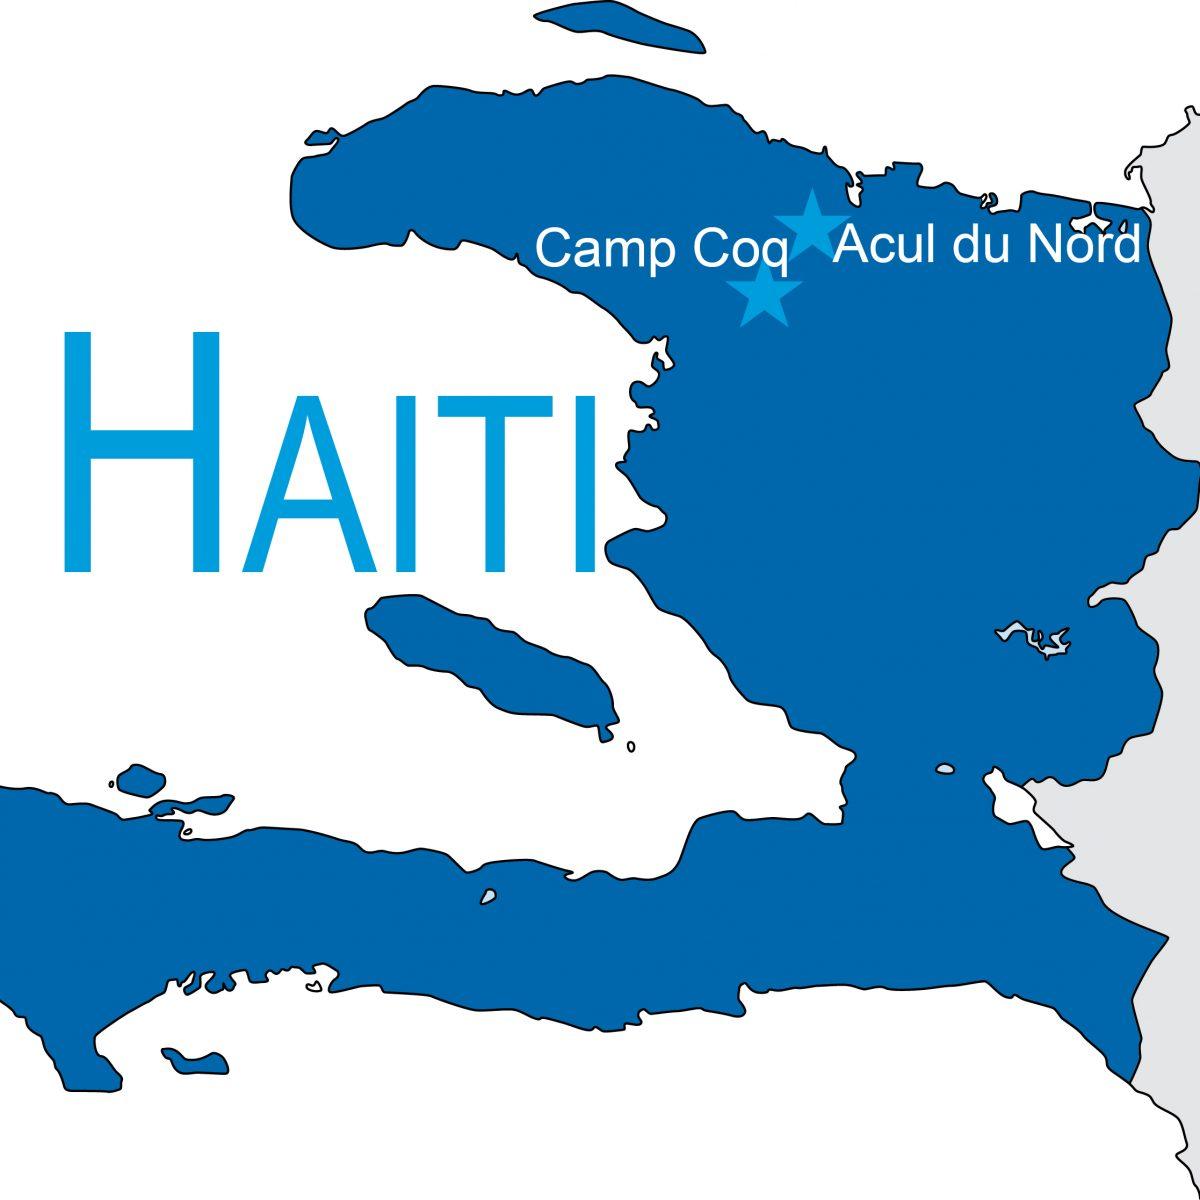 Haiti Map | Care 2 Communities